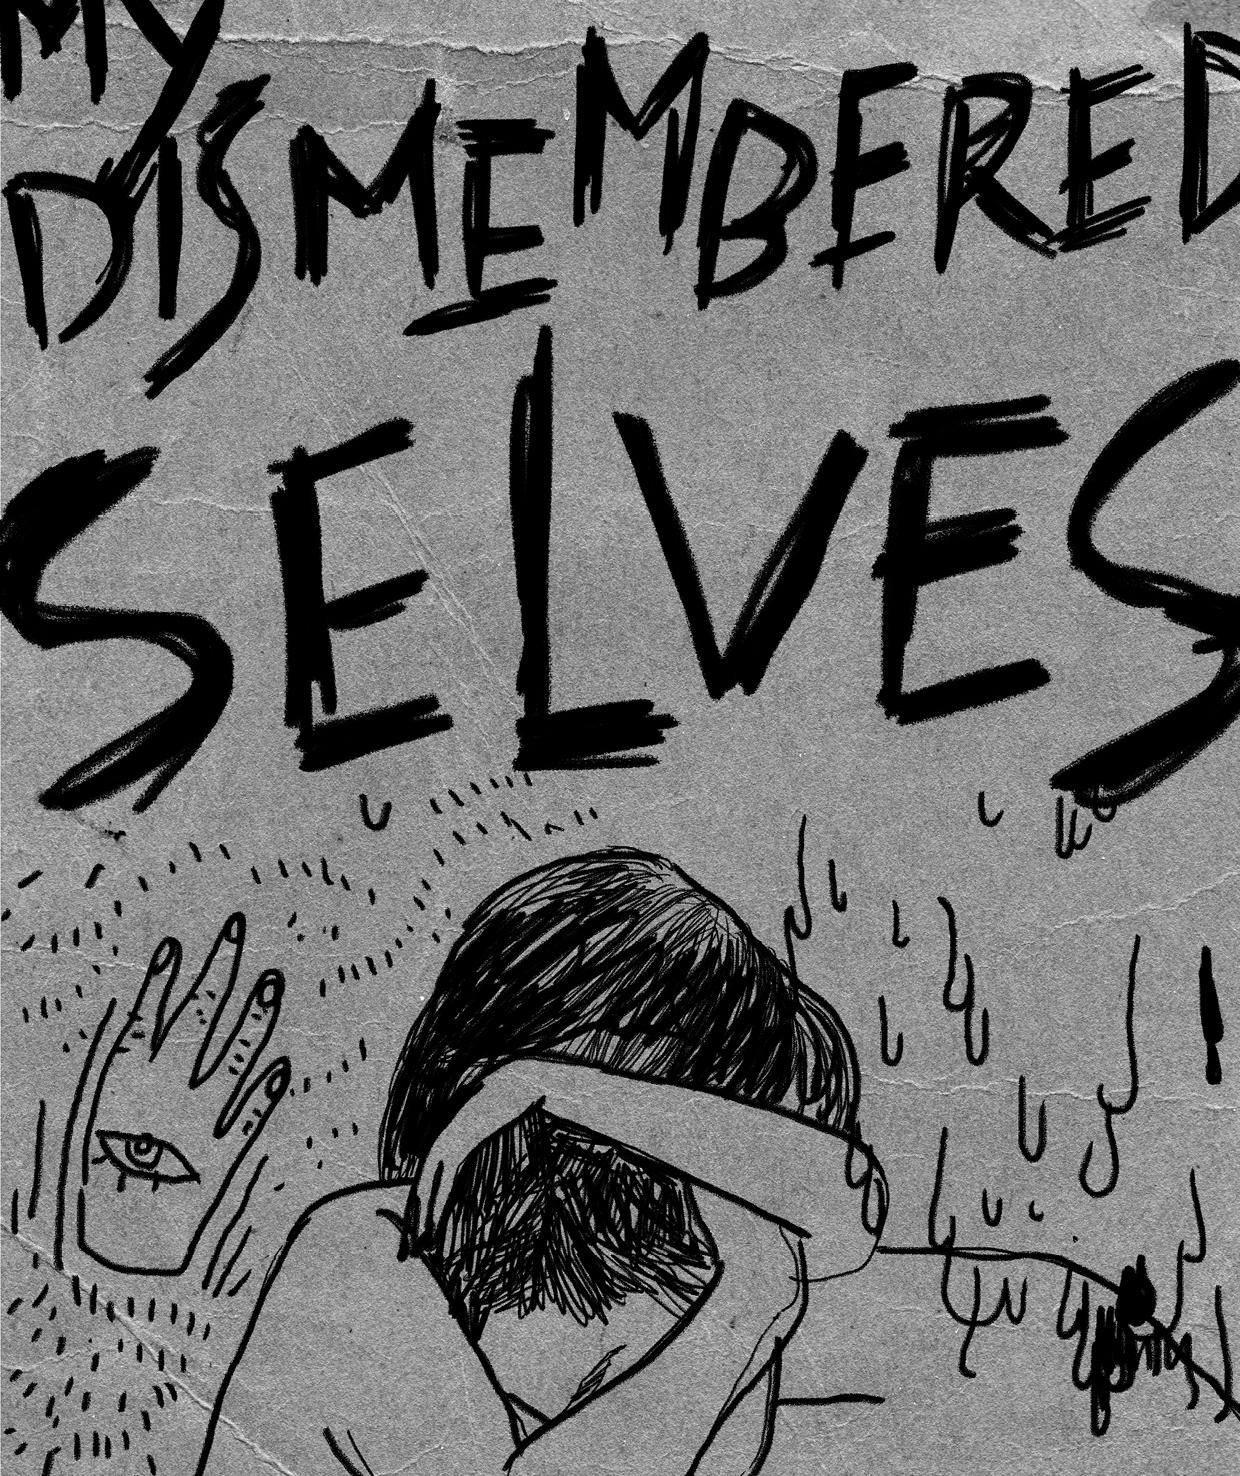 Dismemebered self.jpg